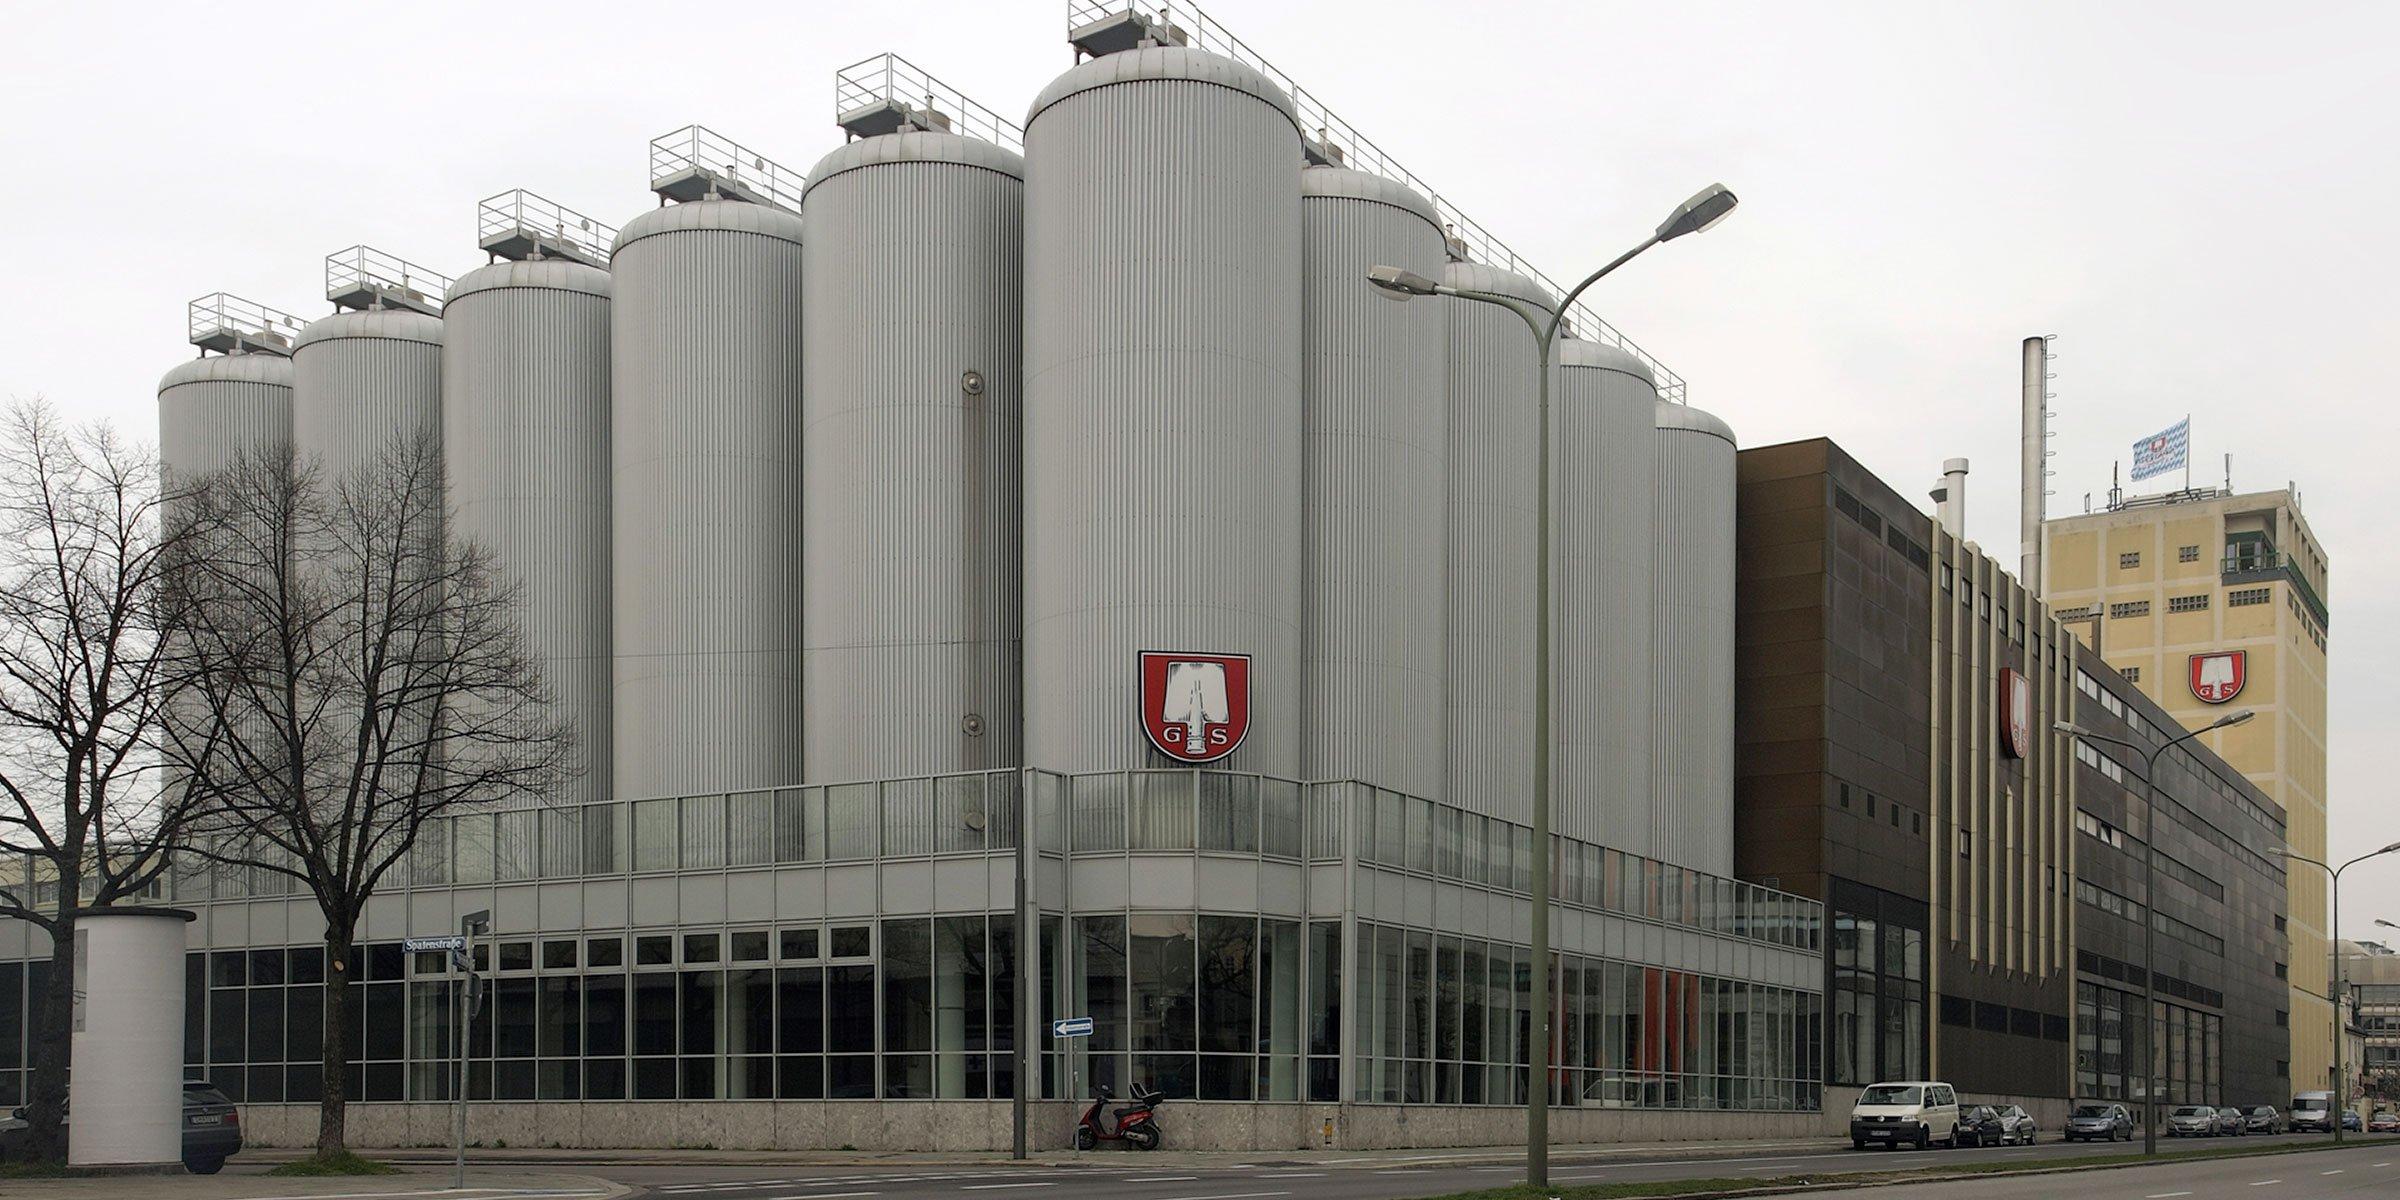 Outside the Spaten-Franziskaner-Bräu production facility in Munich, Germany